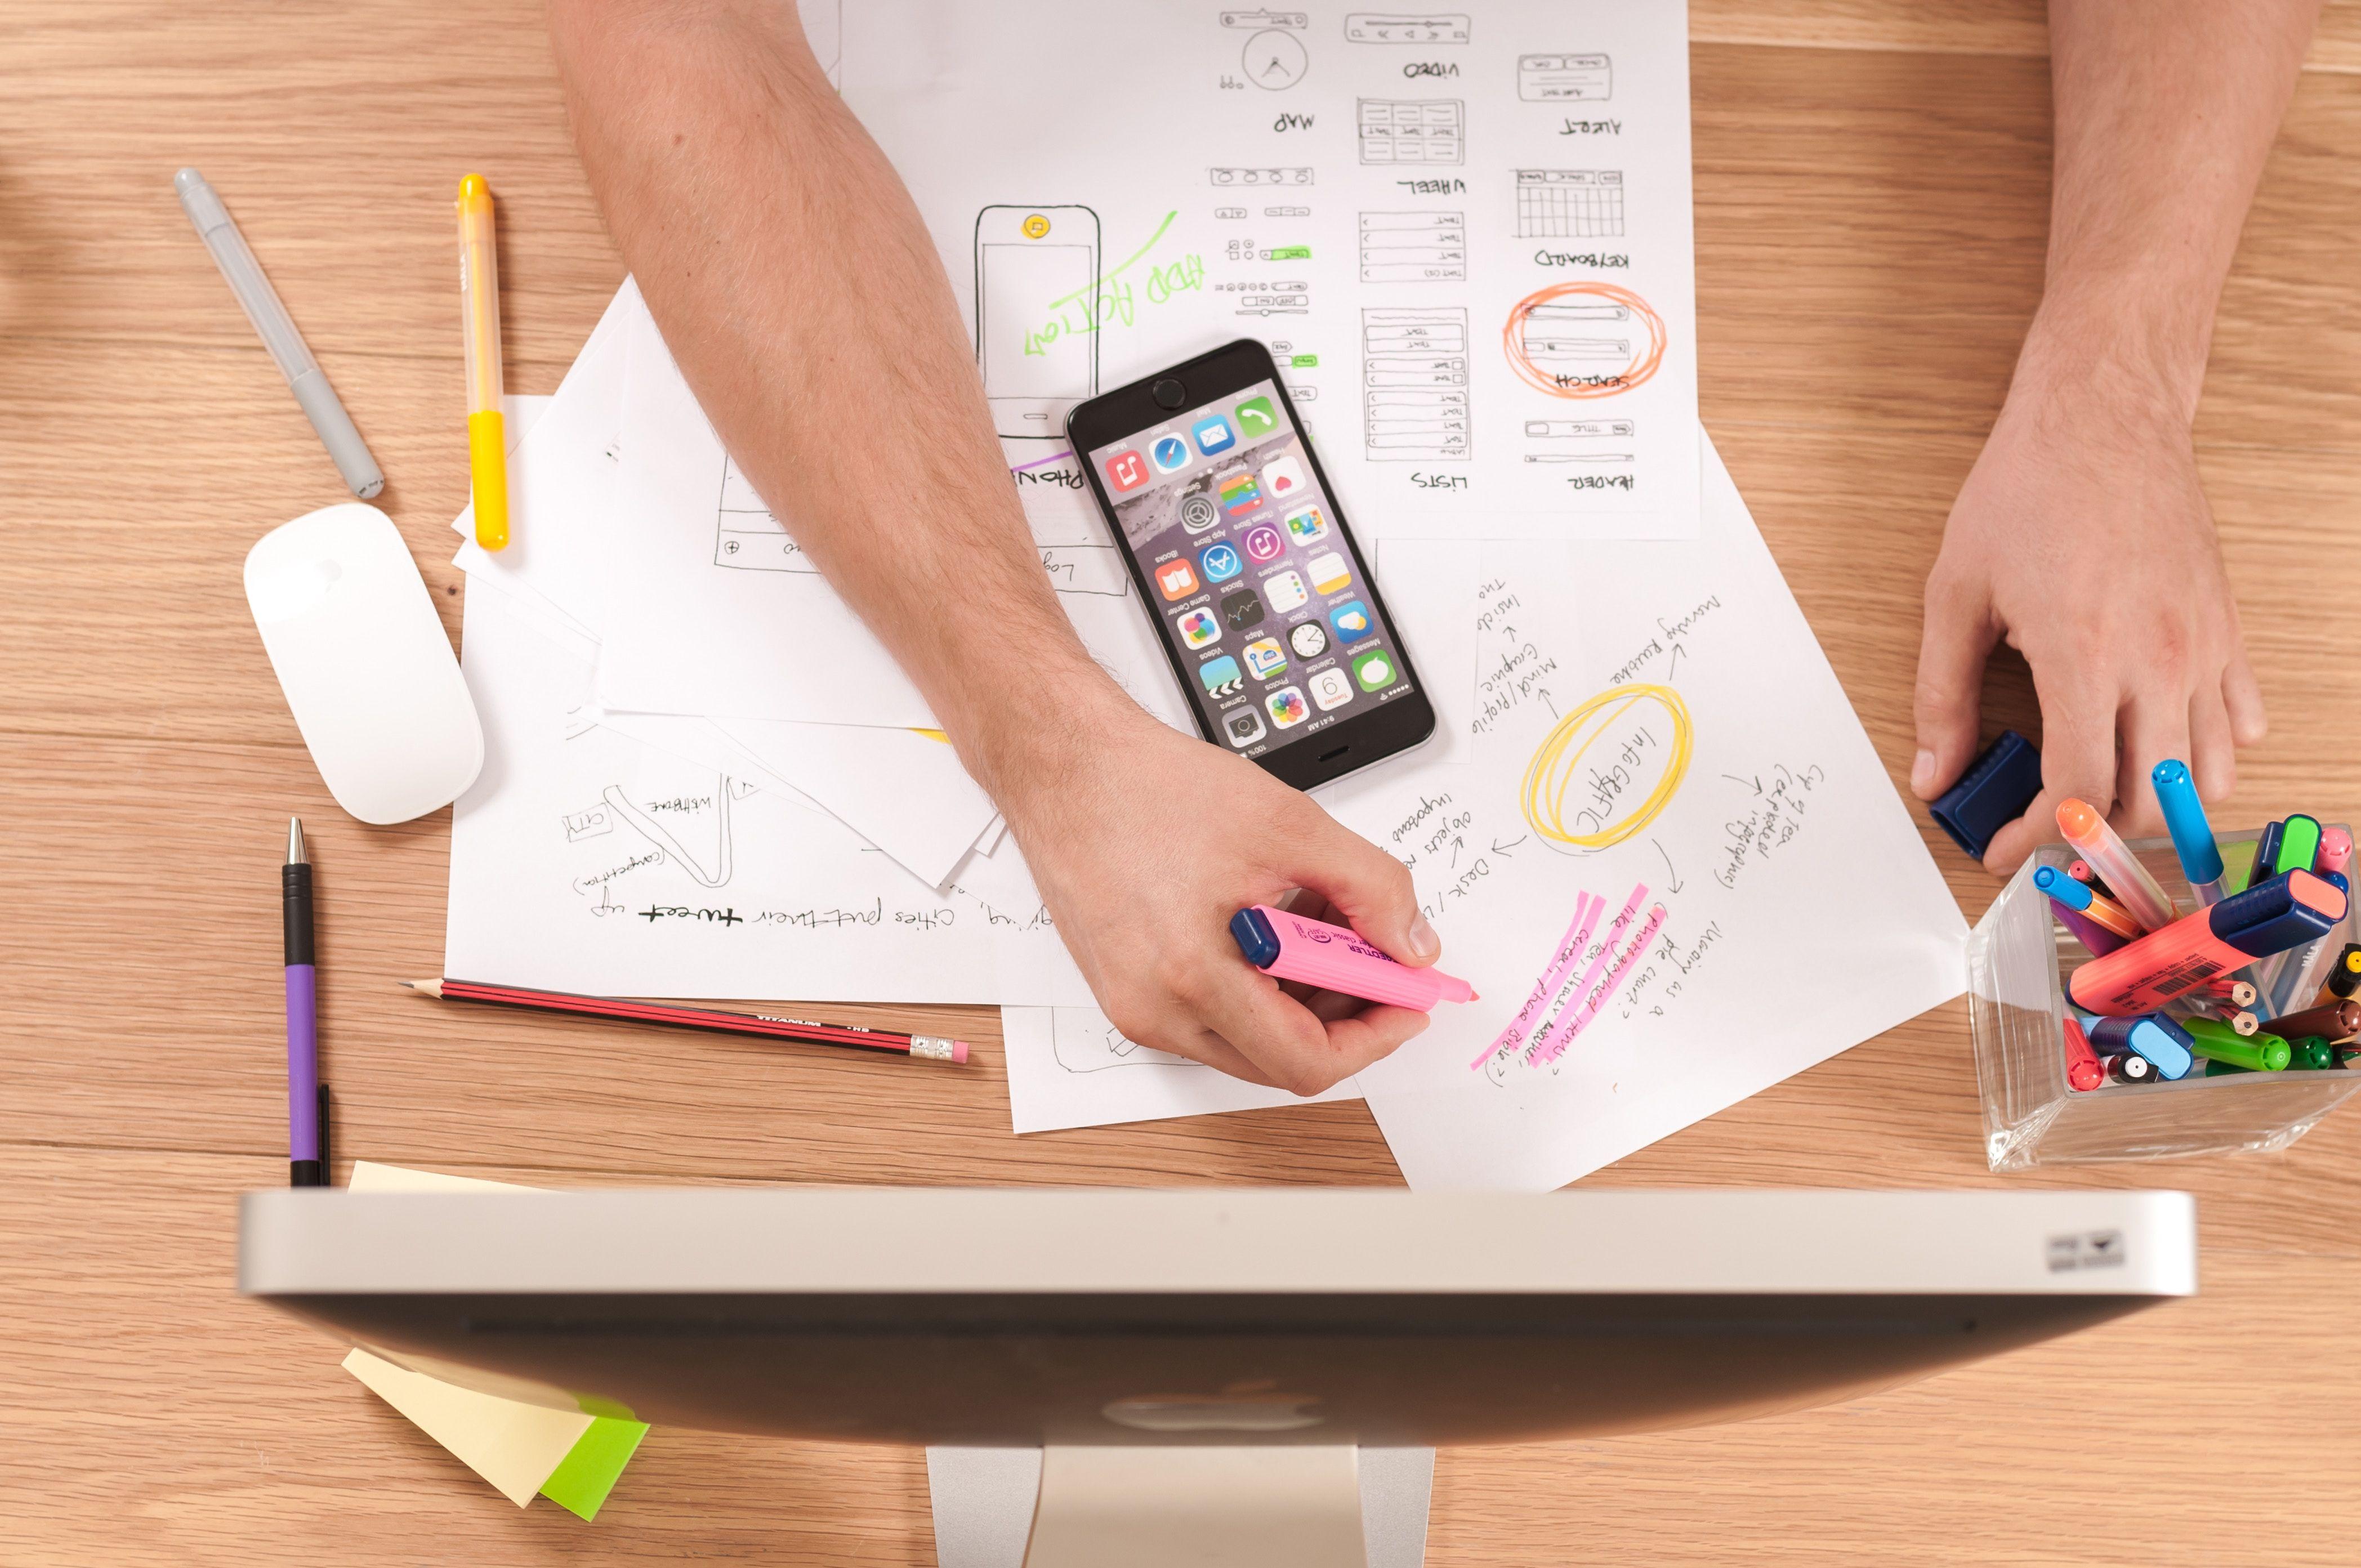 Eunoia Digital - UX Writing: cómo comunicas puede afectar a tu conversión